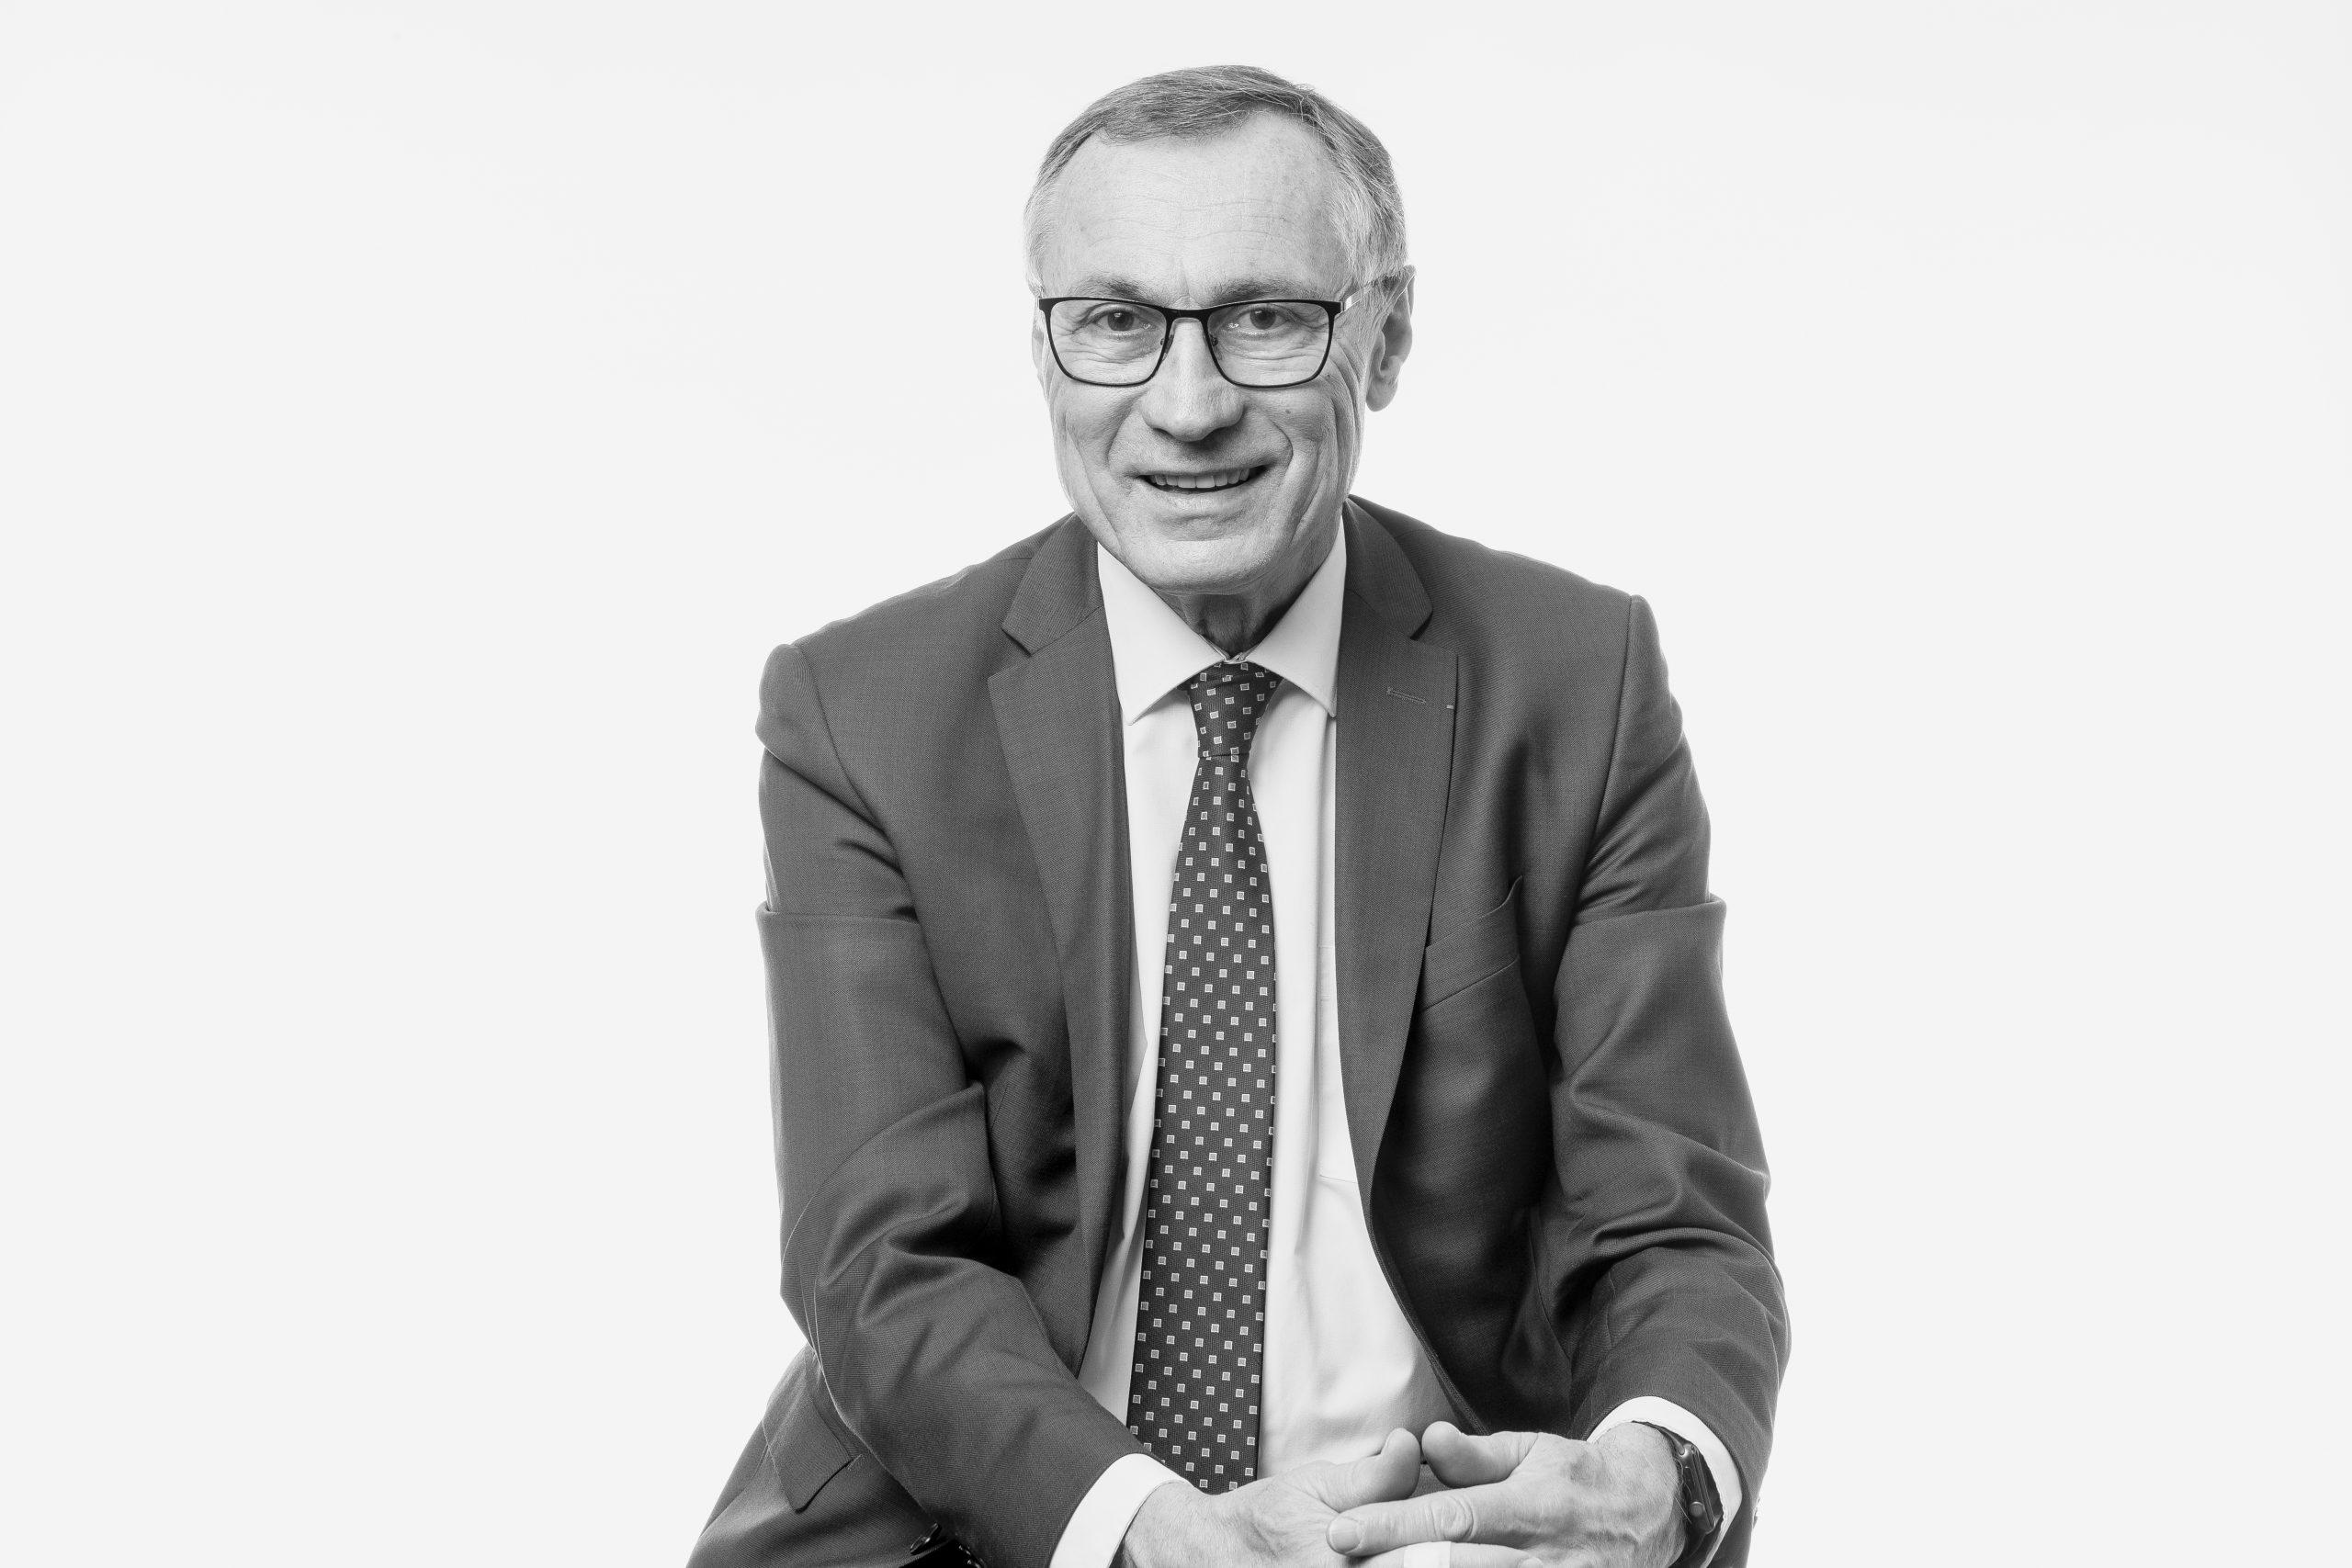 Tilder – Jean-Marie Bockel